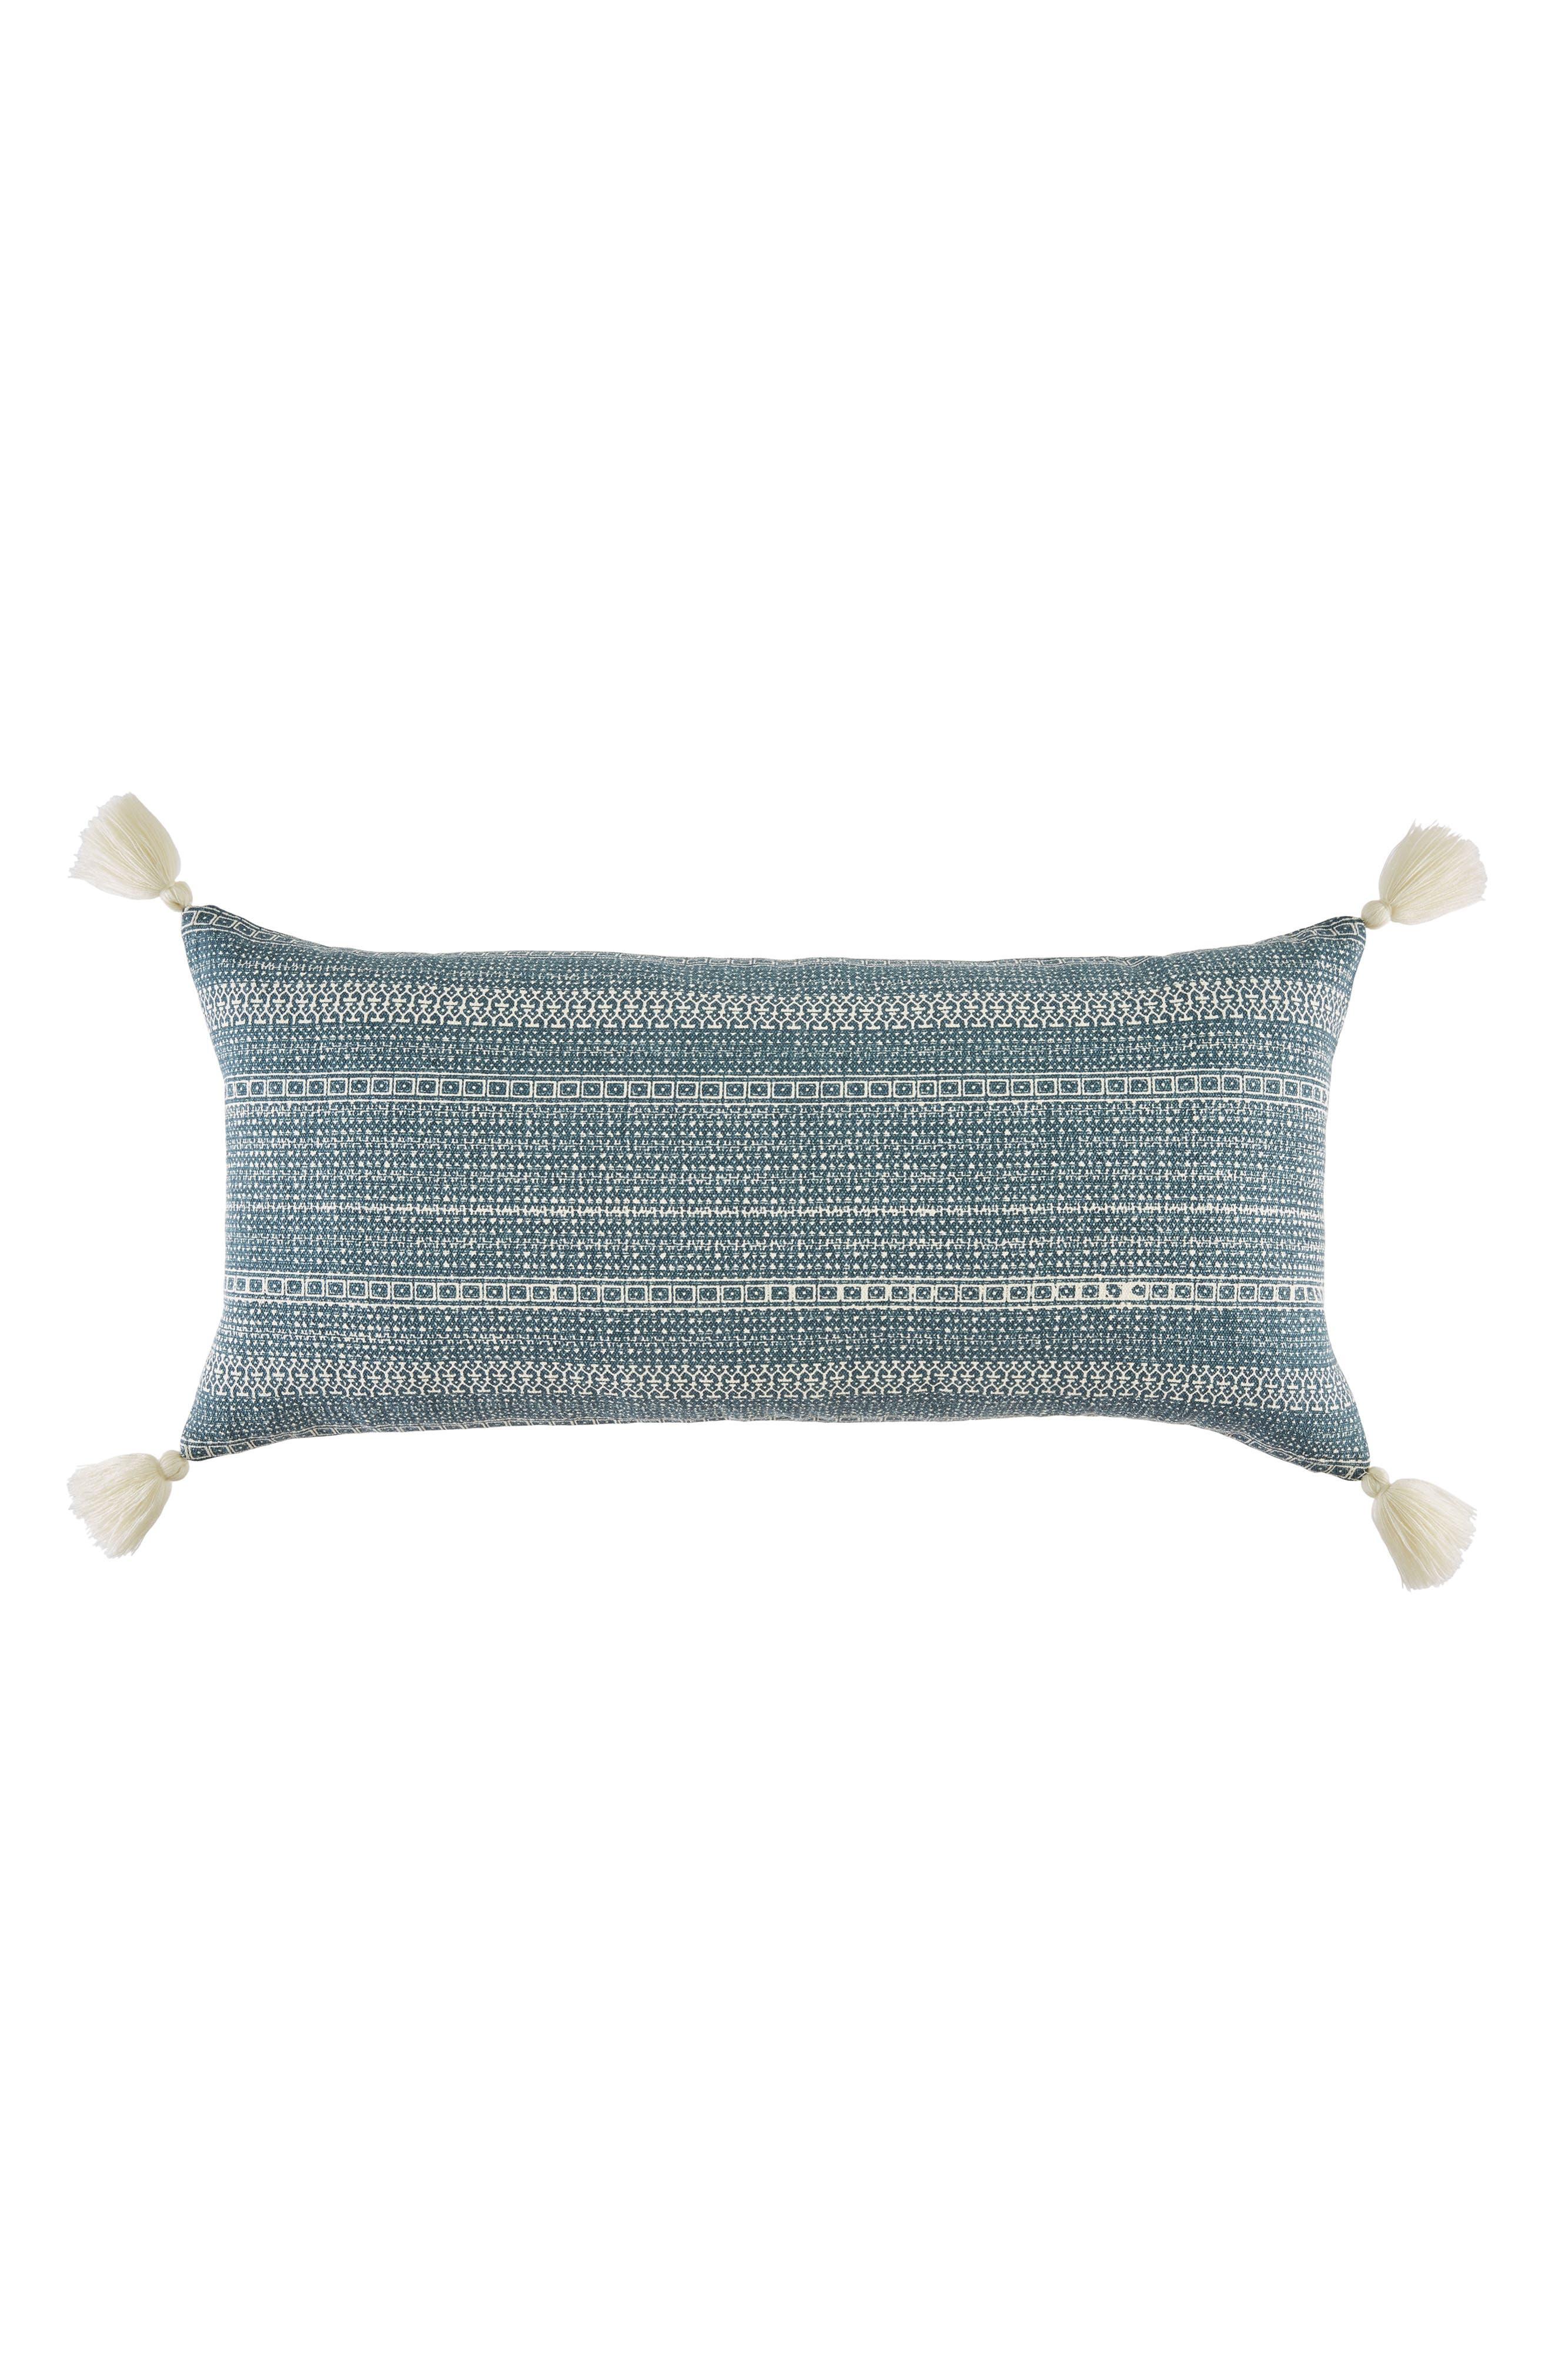 Sumi Accent Pillow,                             Main thumbnail 1, color,                             417